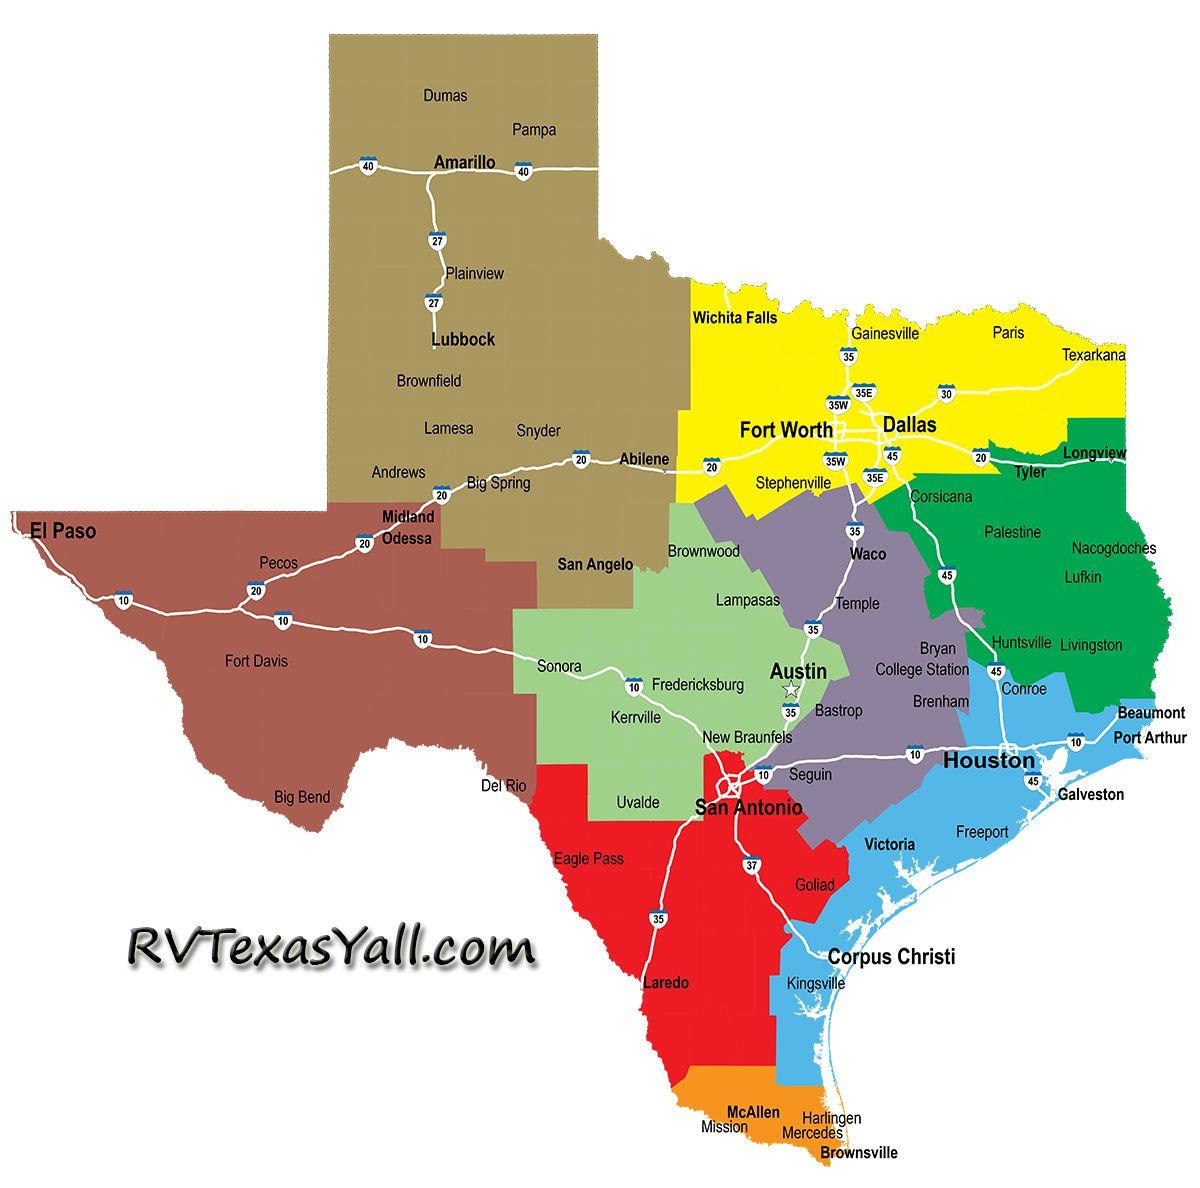 RVTexasYall.com map